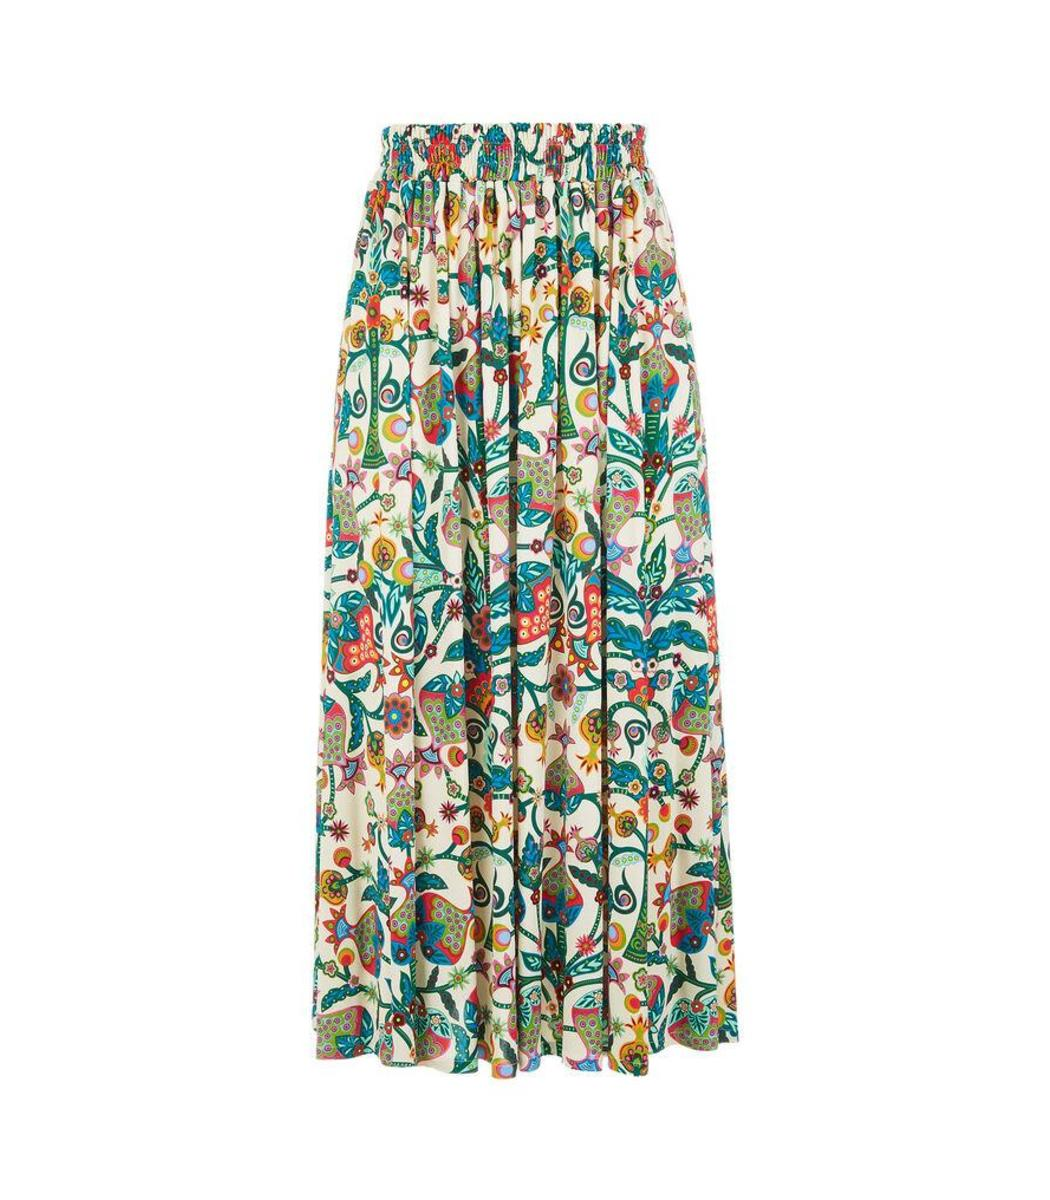 La Doublej Skirts LA DOUBLE J Floral Printed Maxi Skirt